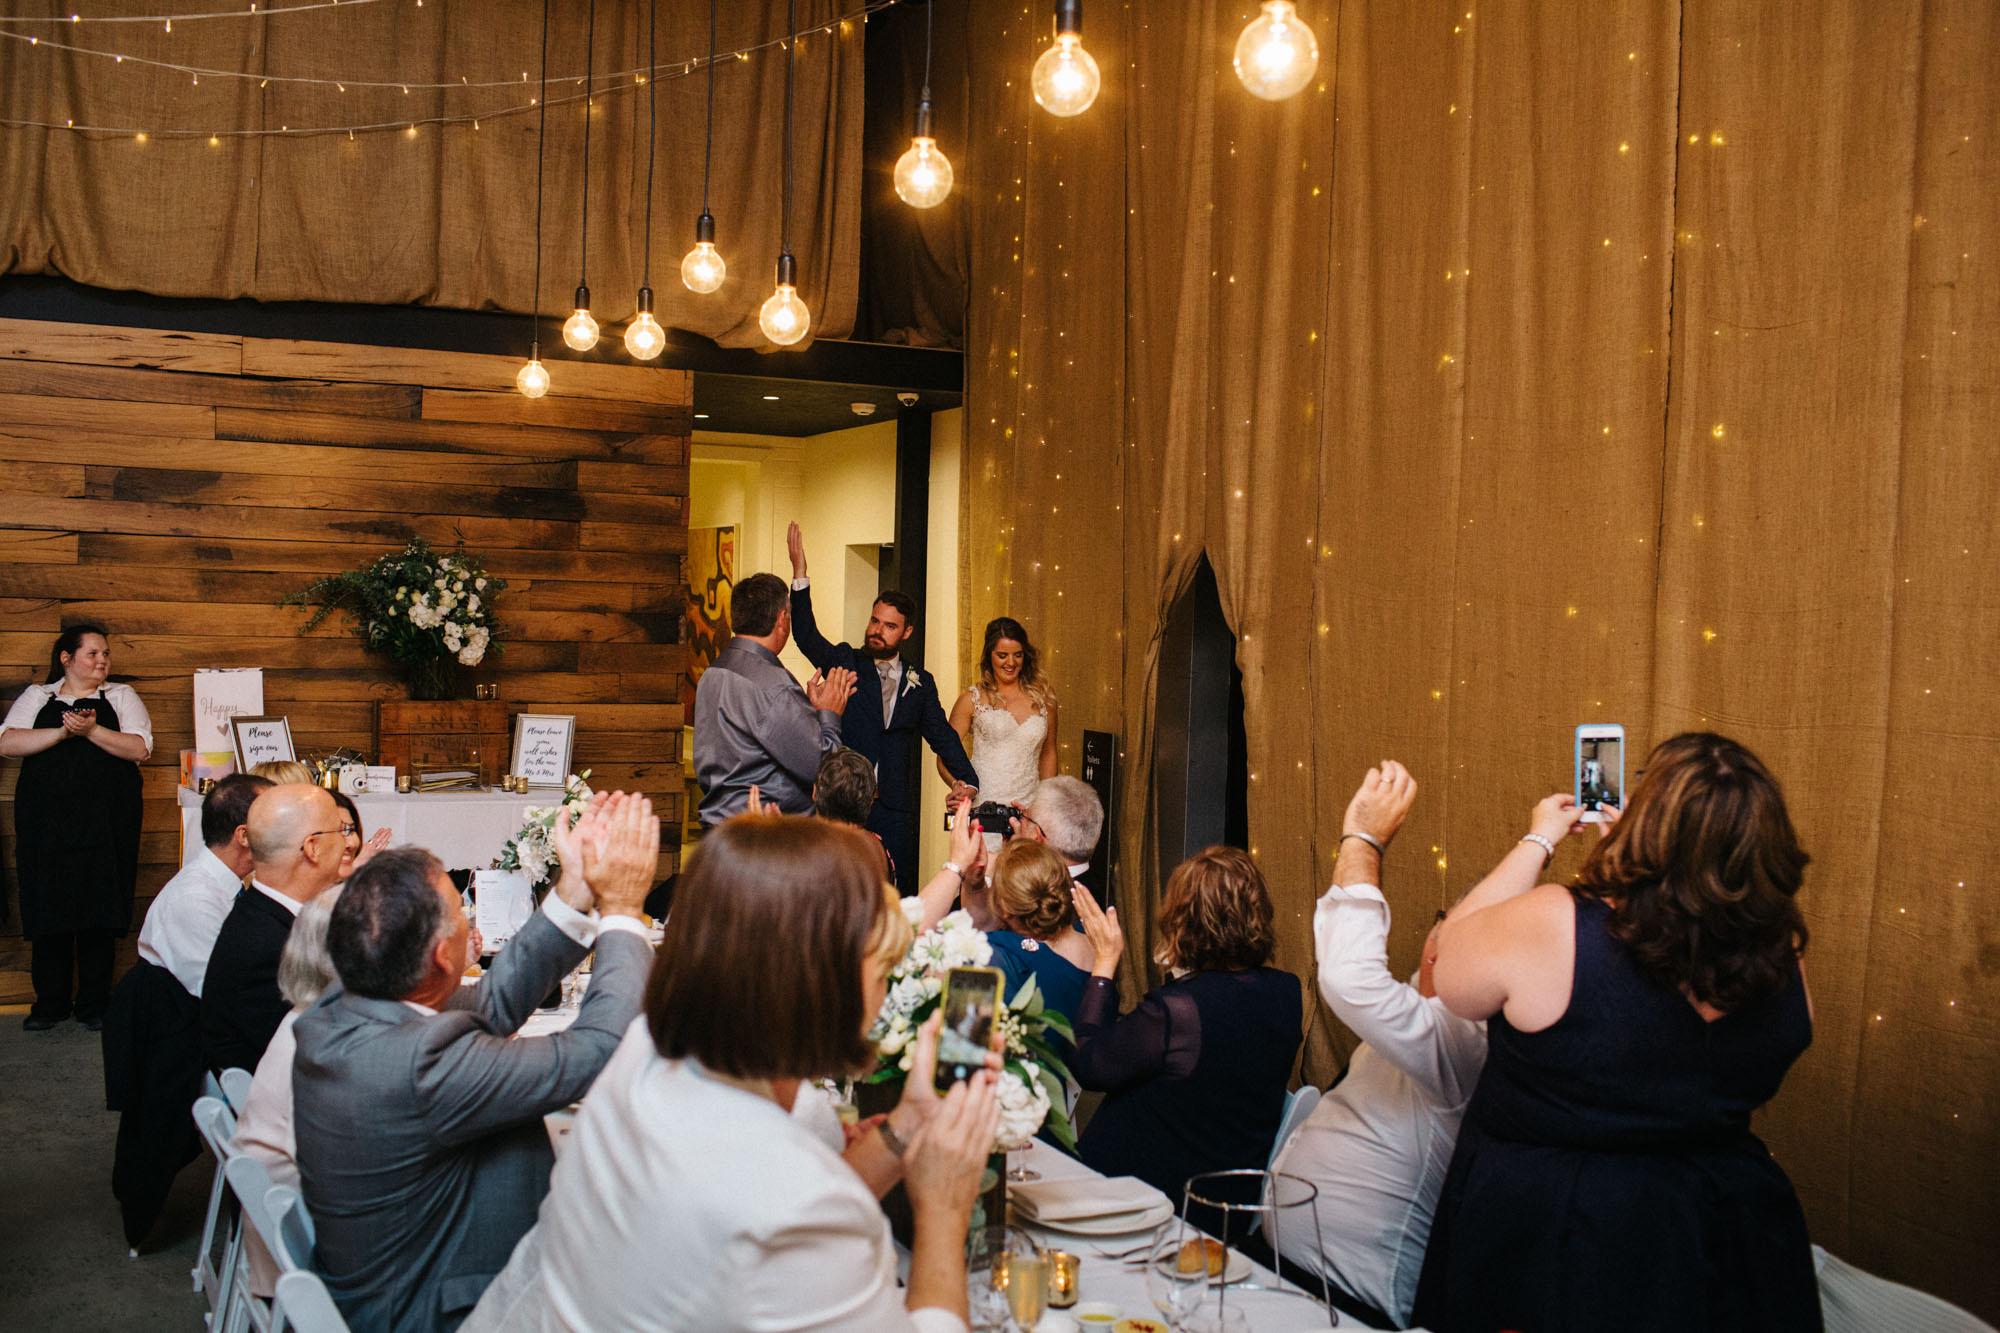 Golding-Wines-wedding-photography-097.jpg